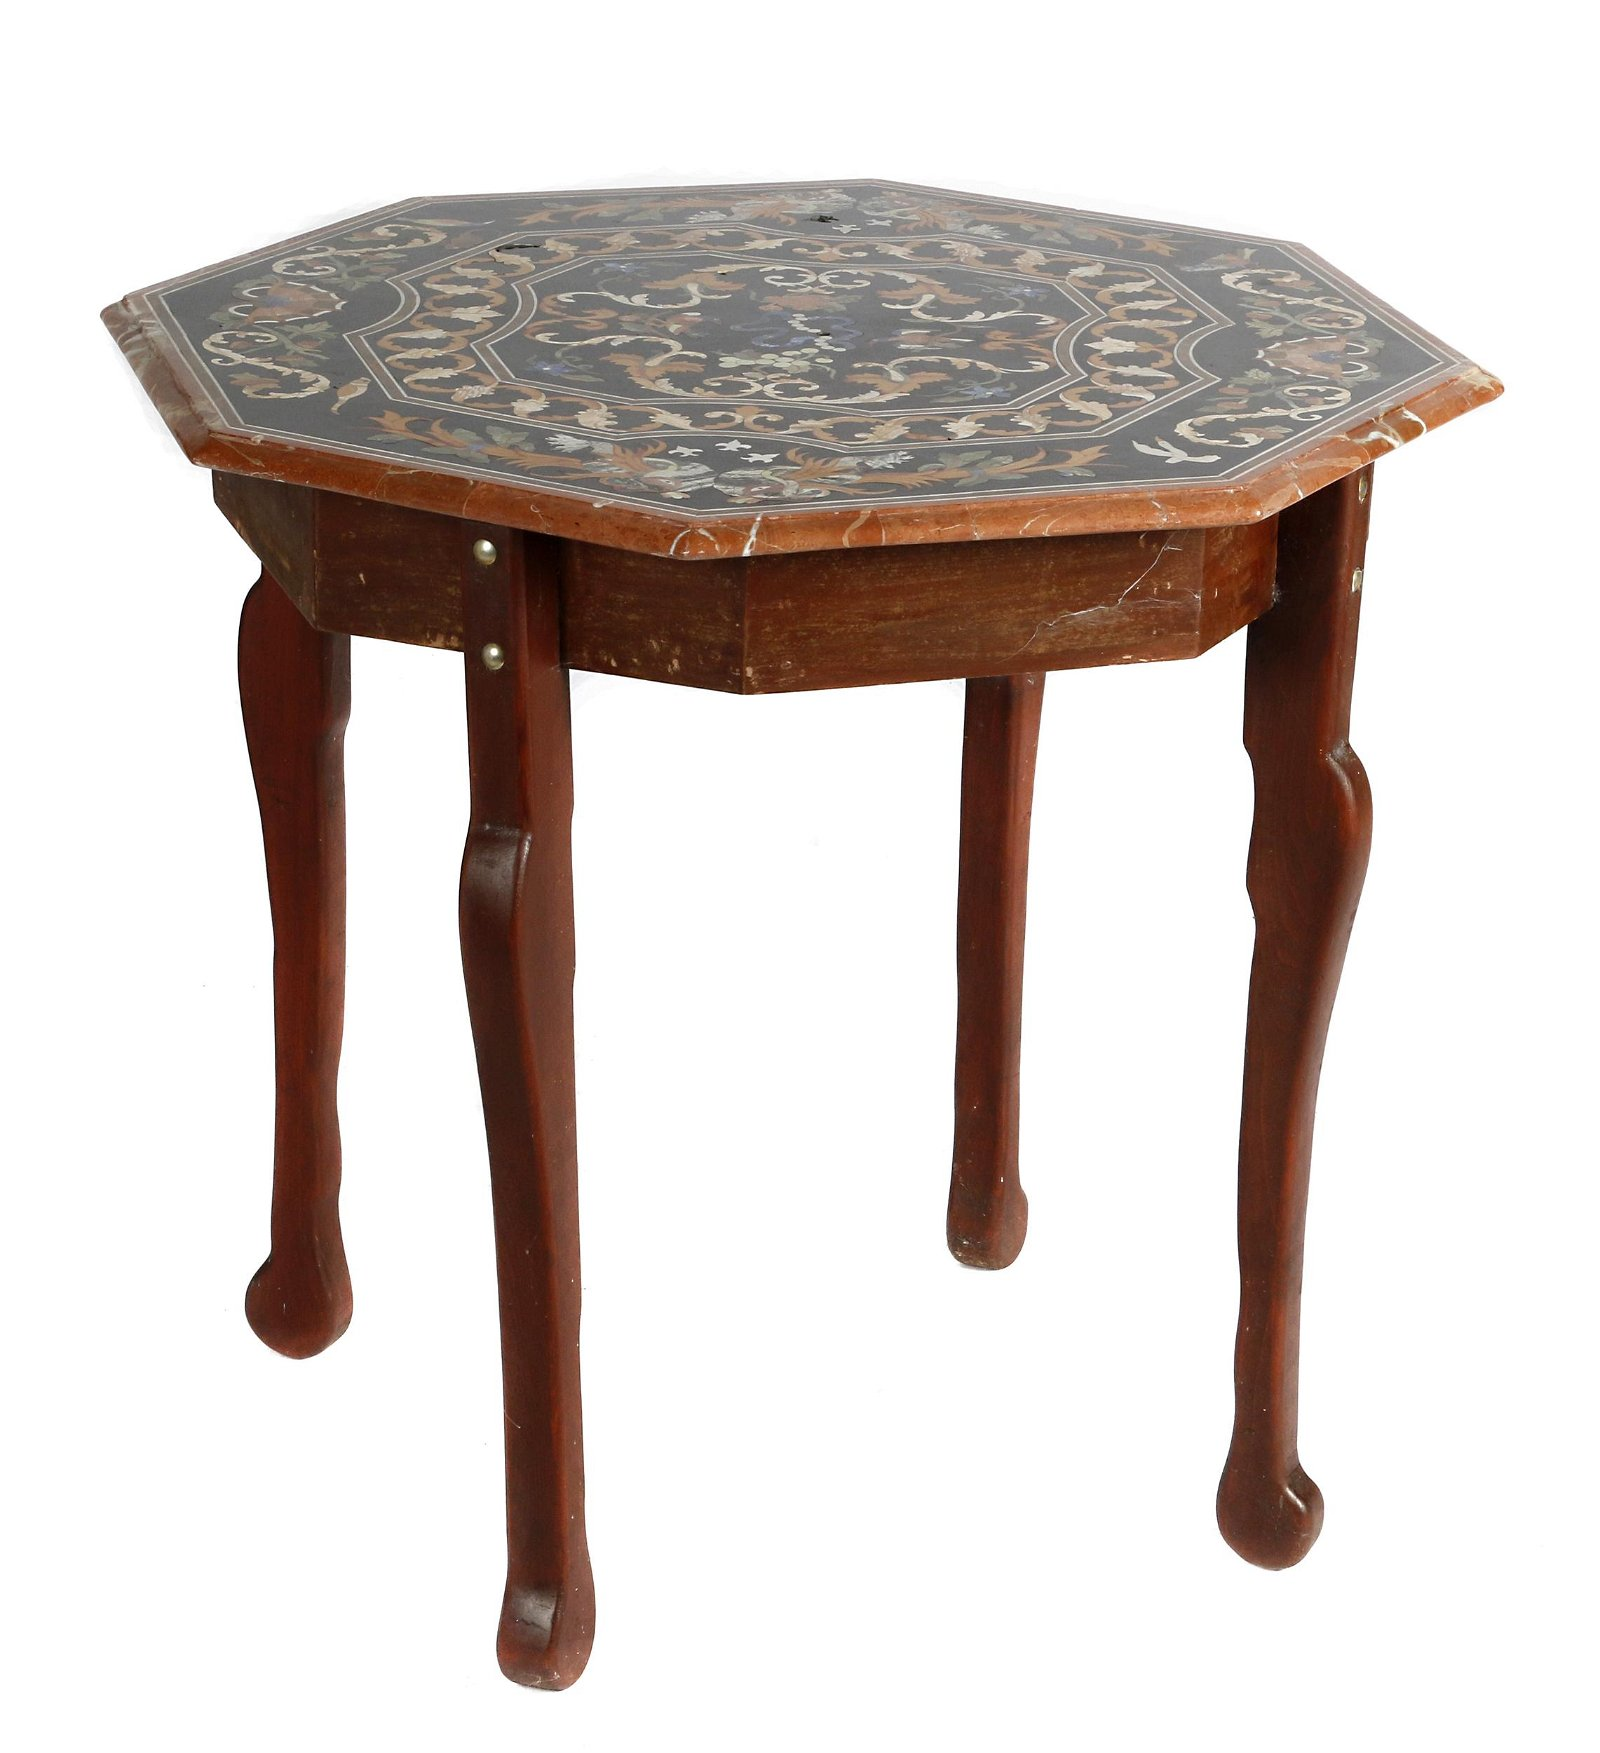 Baroque style Pietra Dura table